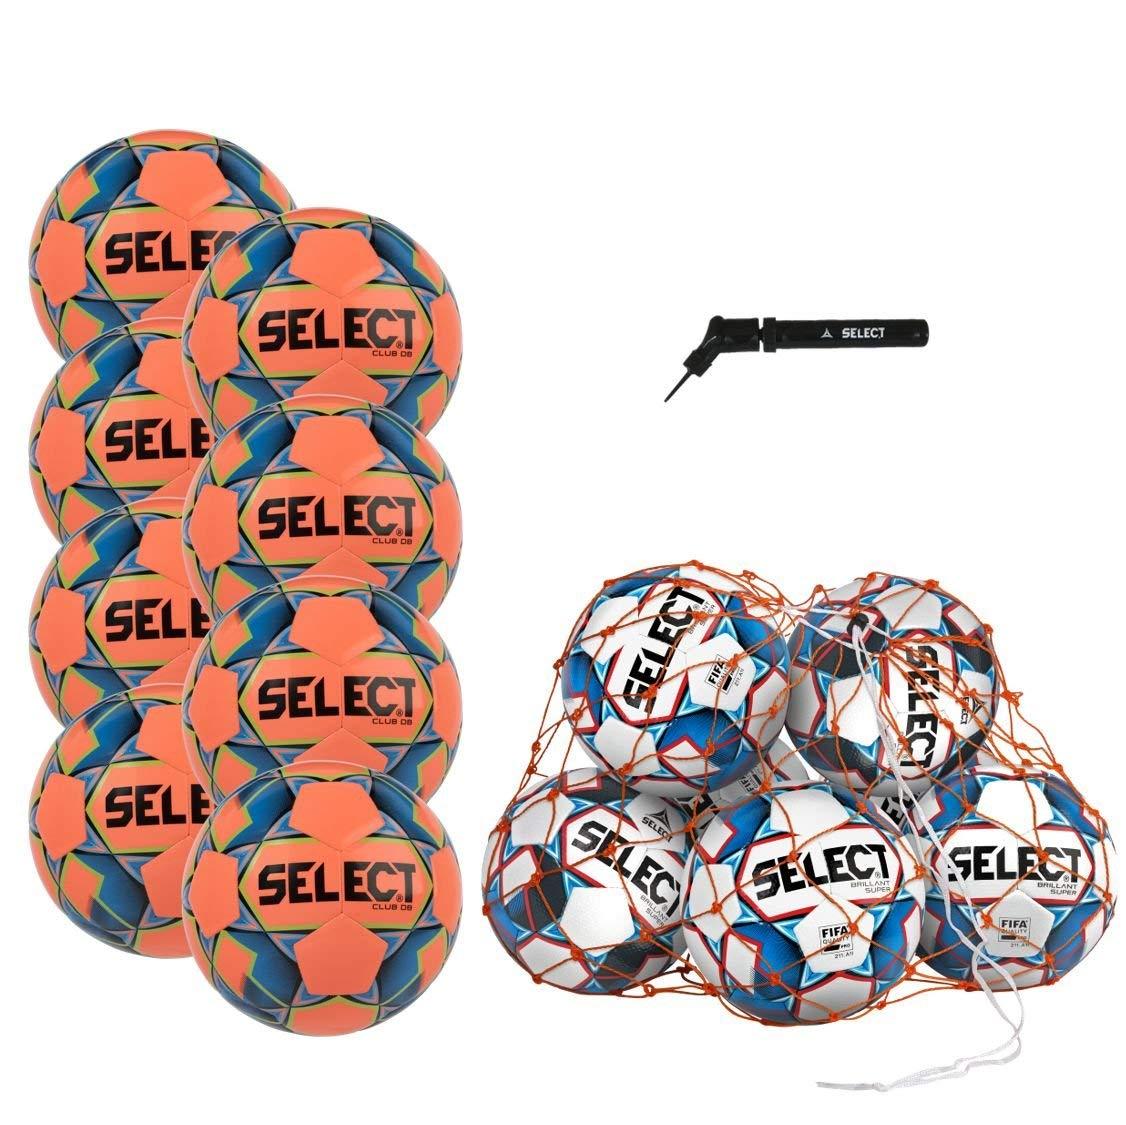 Select Club DB Soccer Ball Package - Pack of 8 Soccer Balls Ball Net Hand Pump, Orange, Size 5